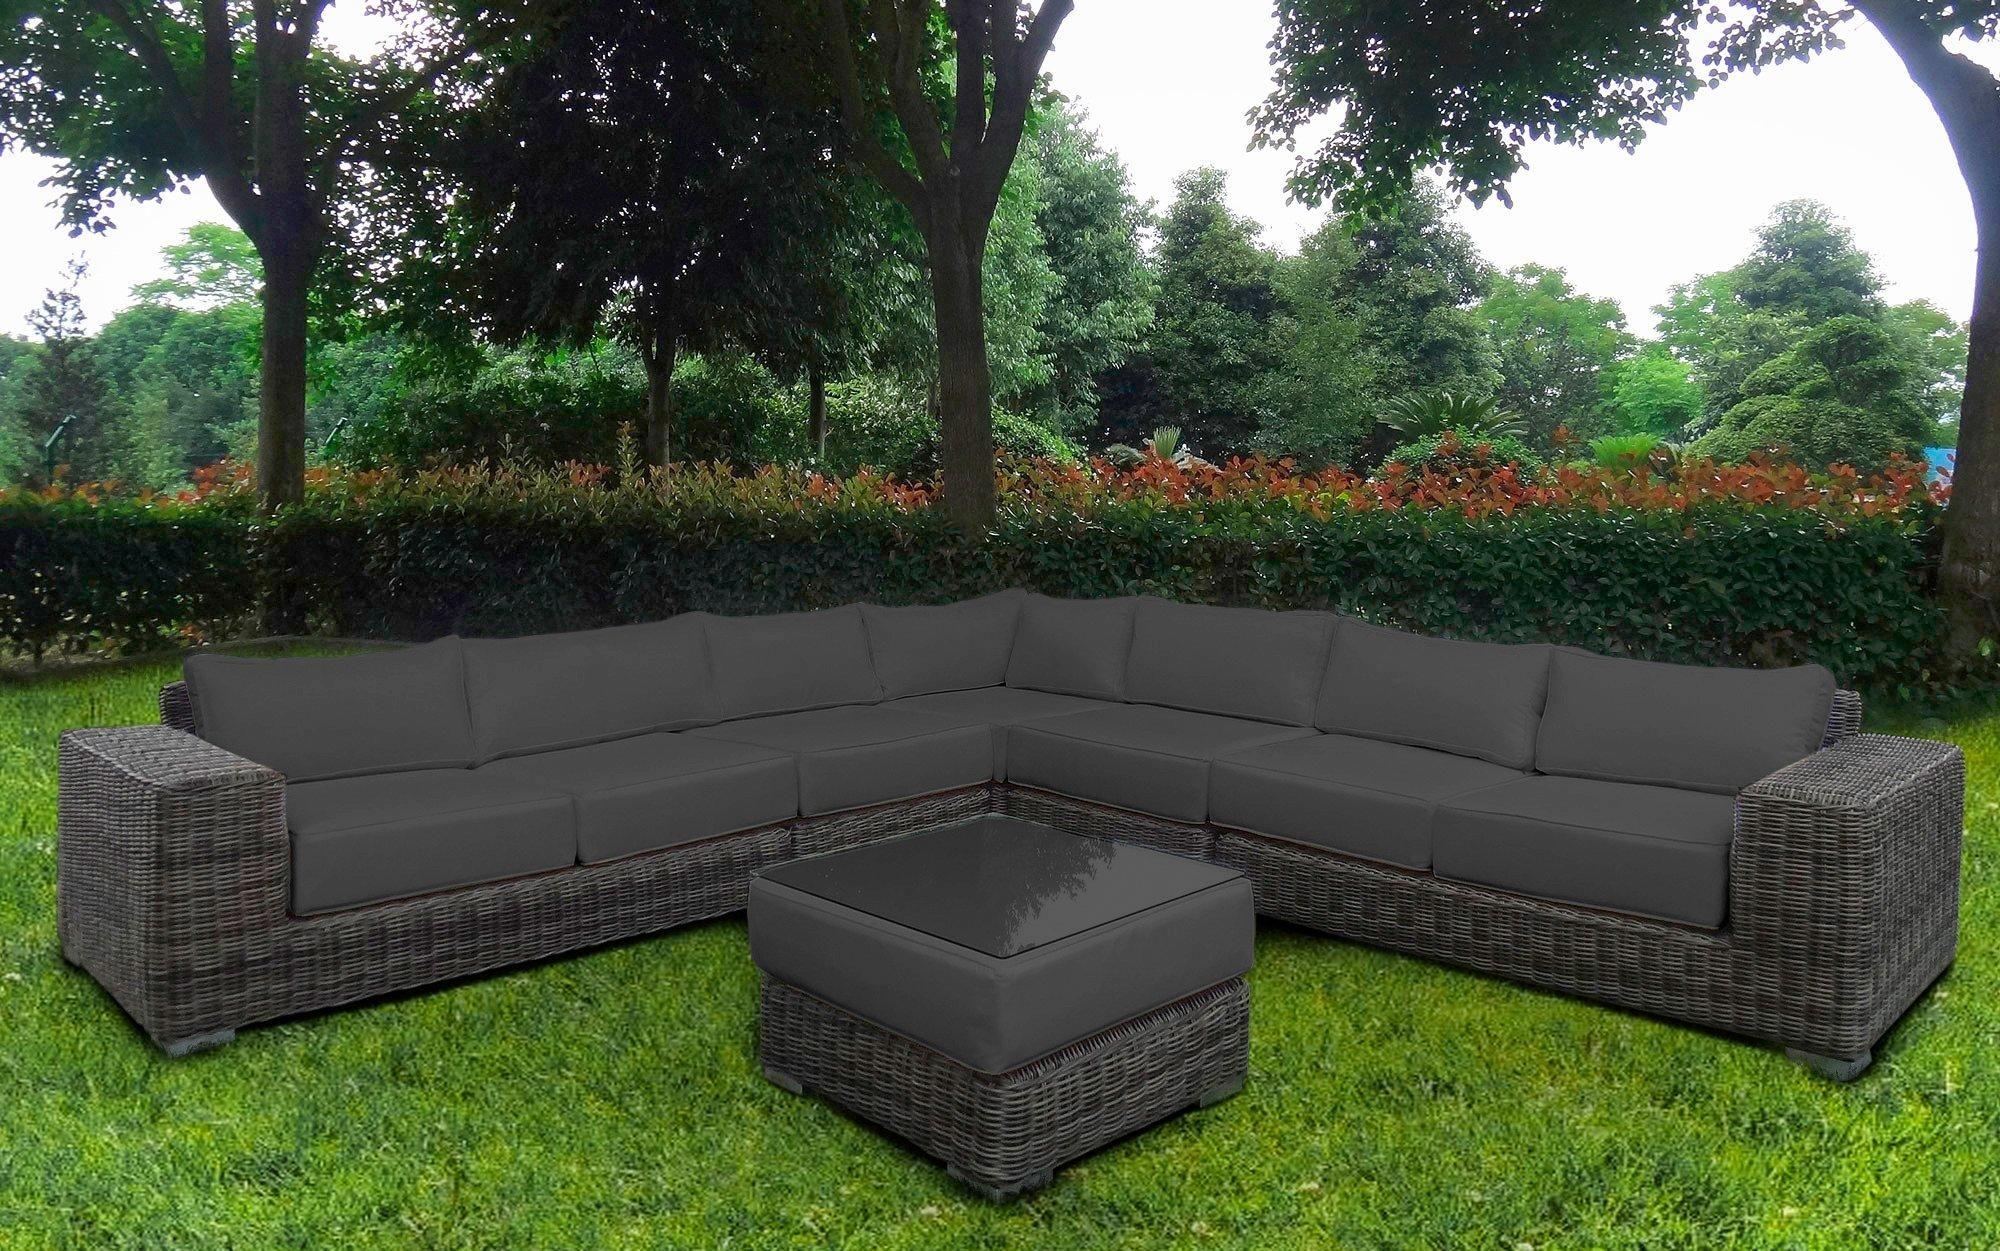 Baidani Loungeset Sensation 21 Tlg Ecklounge Tisch 67x67x40 Cm Polyrattan Lounge Mobel Loungemobel Garten Polyrattan